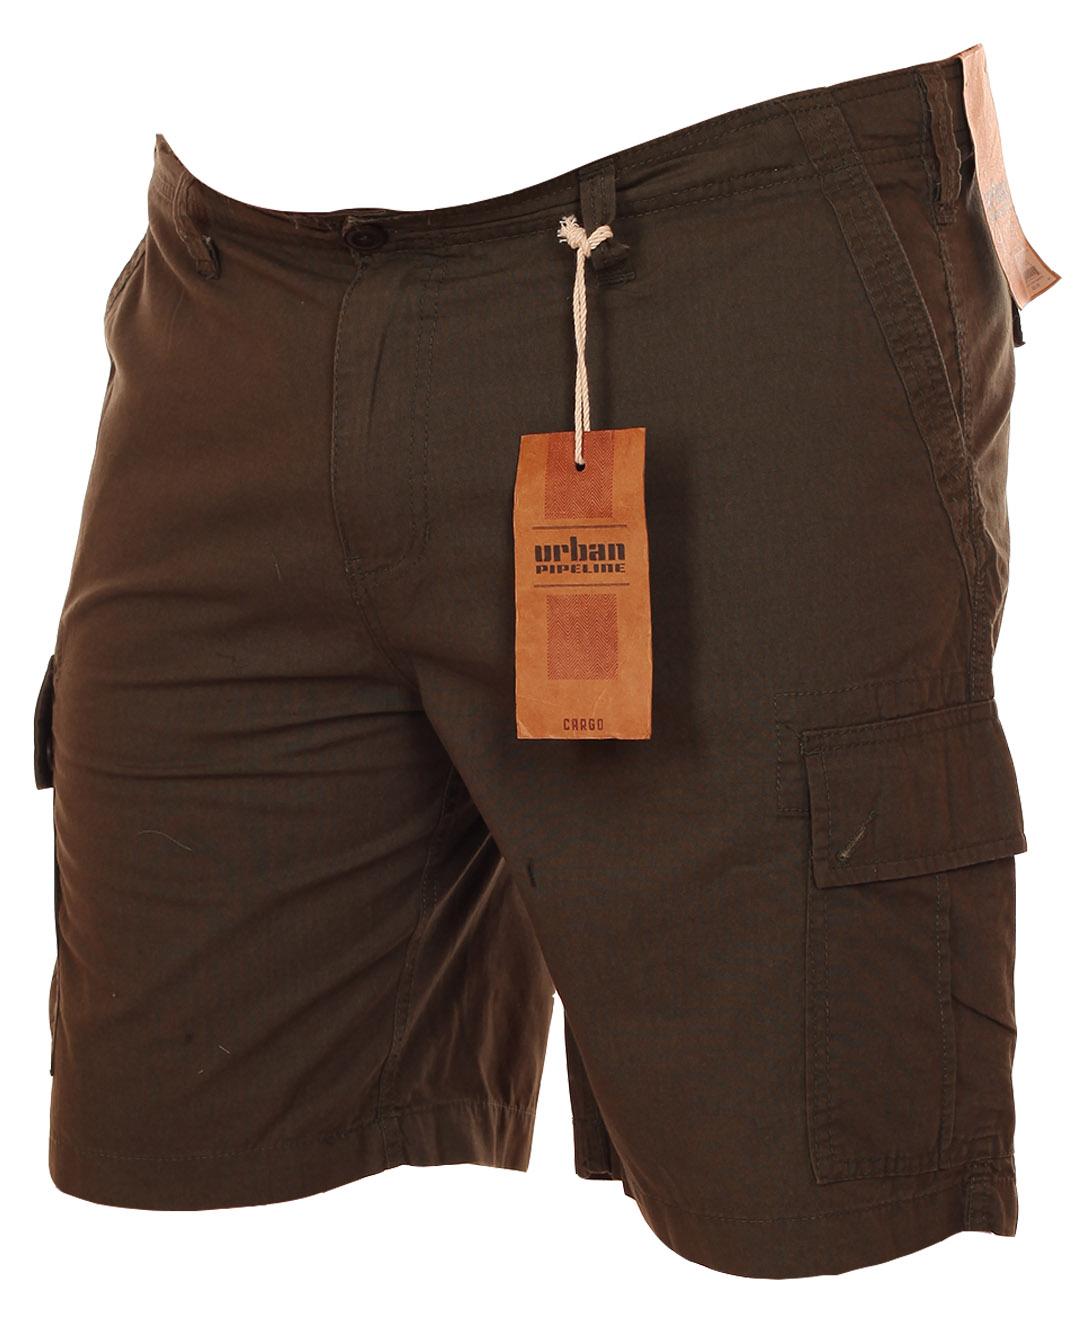 Купить шорты цвета хаки для супер мужчин - баталы от Urban Pipeline